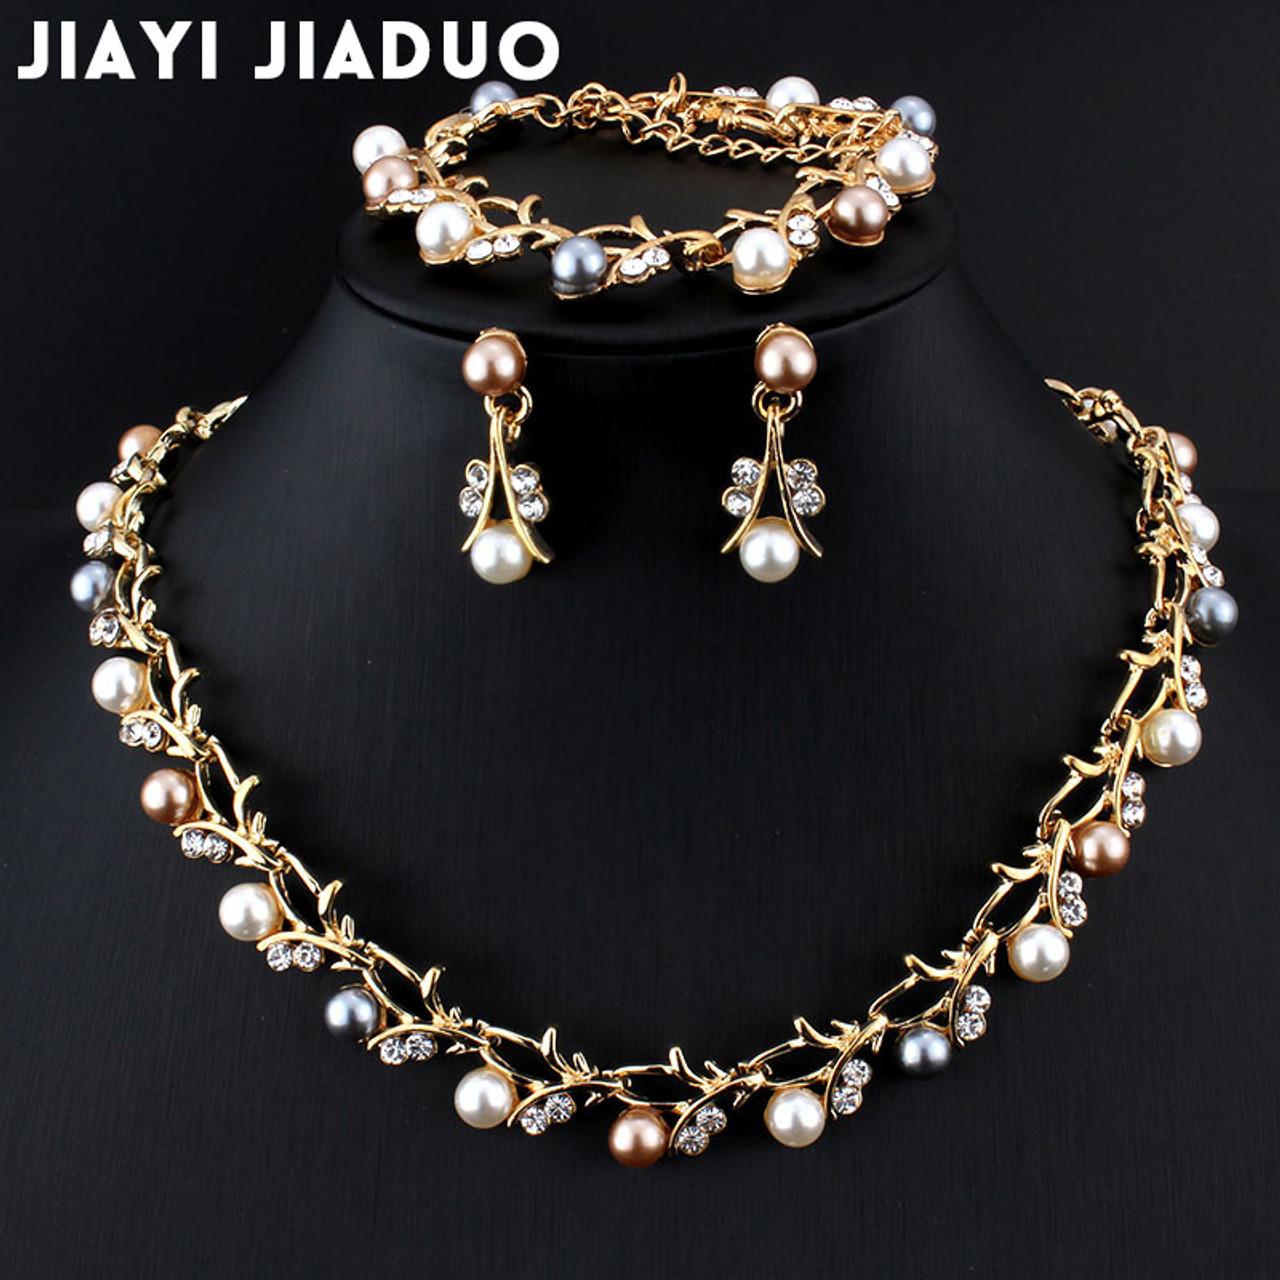 8a2940e28a9f8 jiayijiaduo Hot Imitation Pearl Wedding necklace earring set Bridal jewelry  set for women Elegant Party Gift Fashion Costume